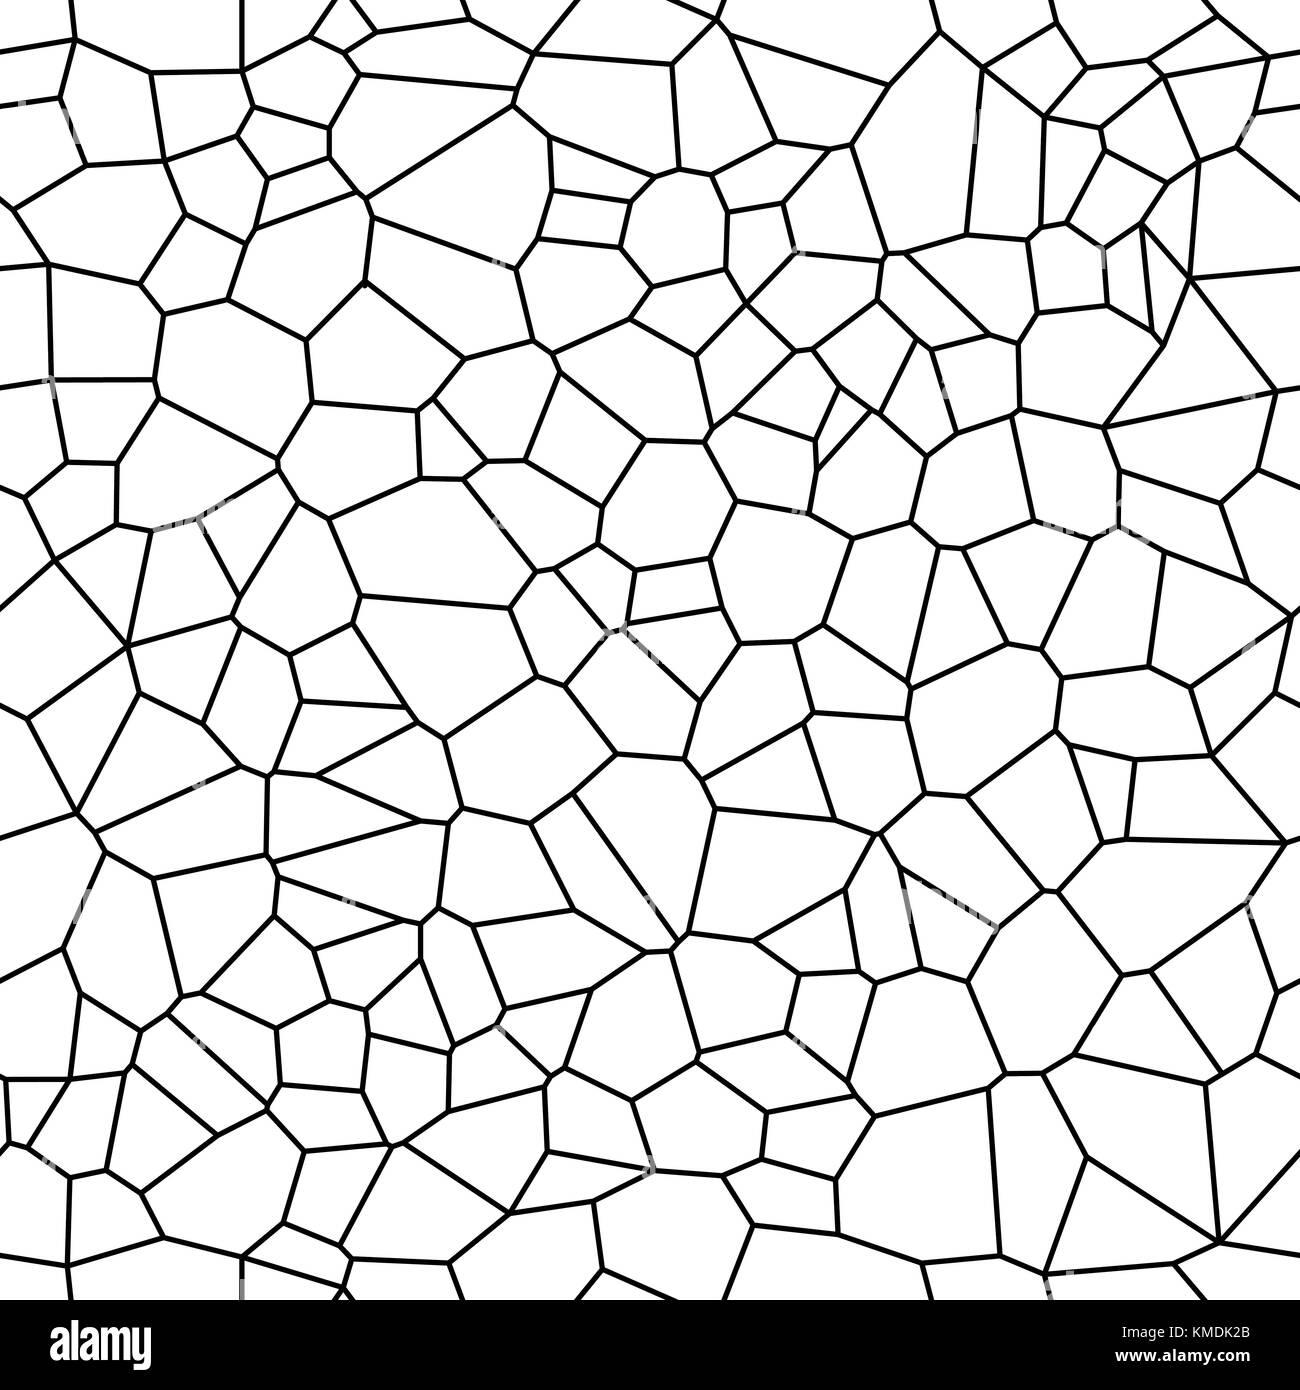 Seamless Vector Background From Cells Irregular Mosaic